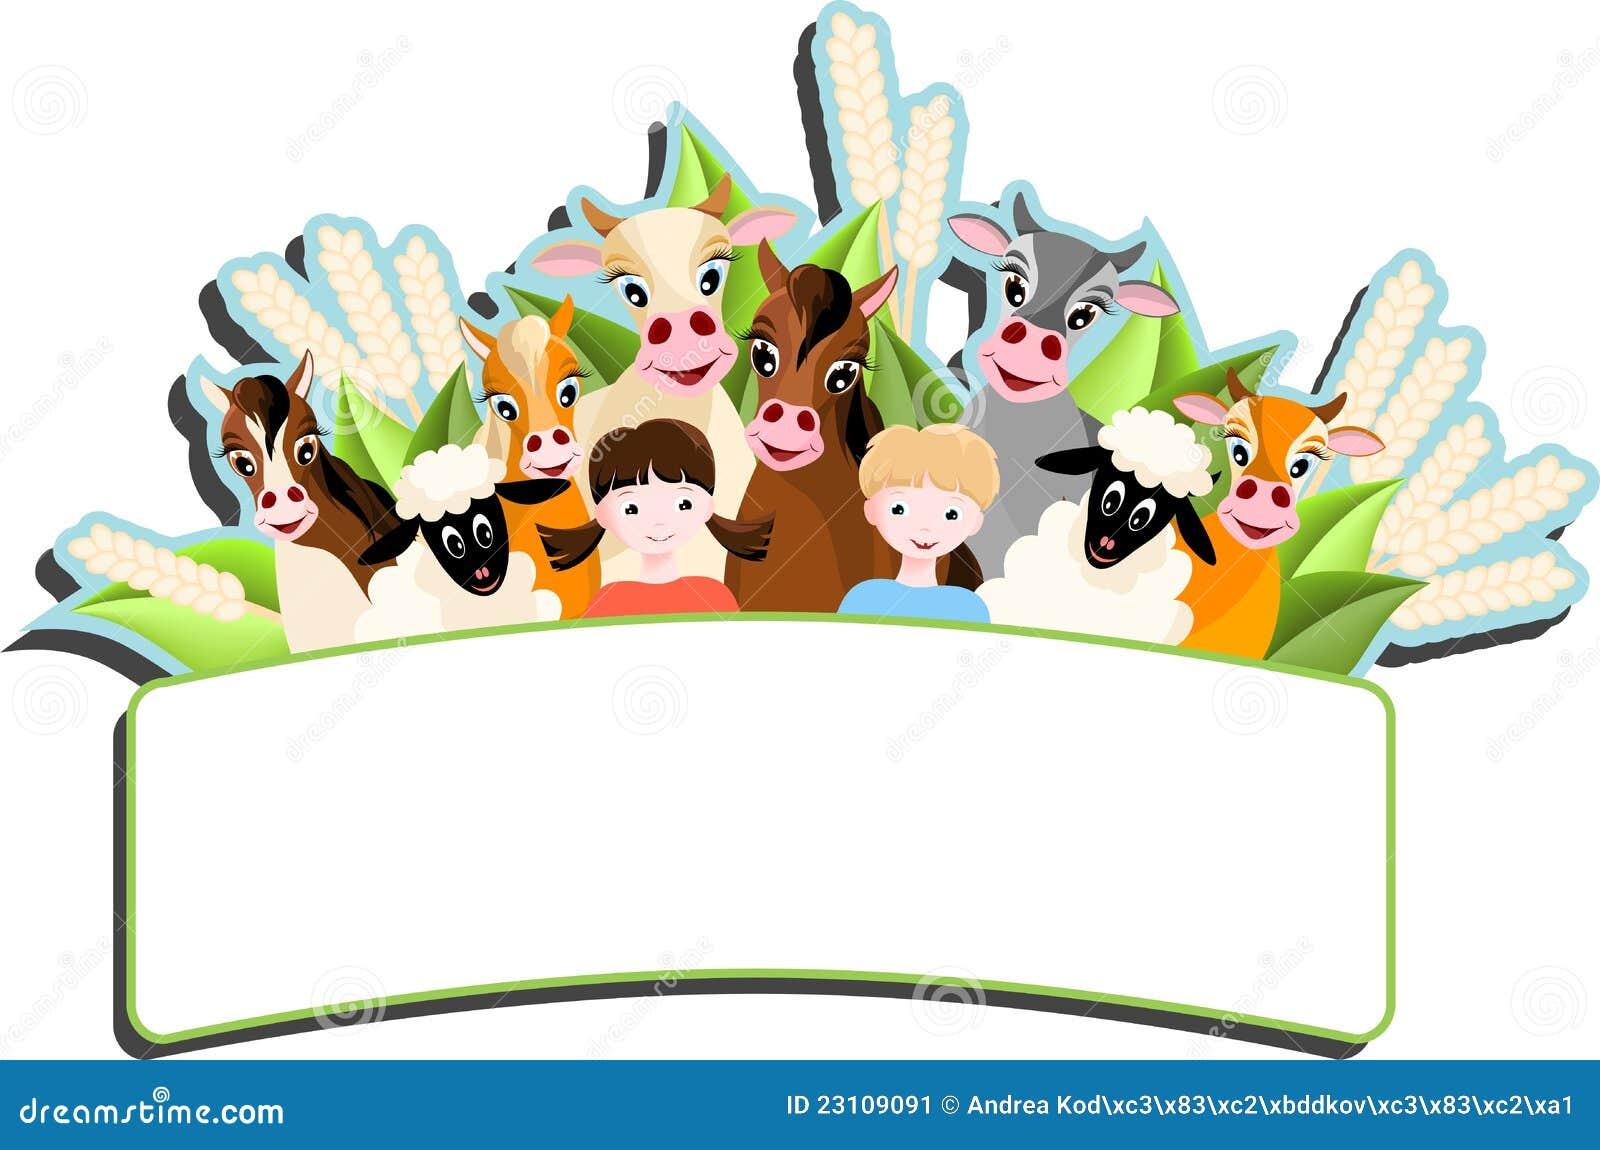 Image Result For Farm Animals Wallpaper Border